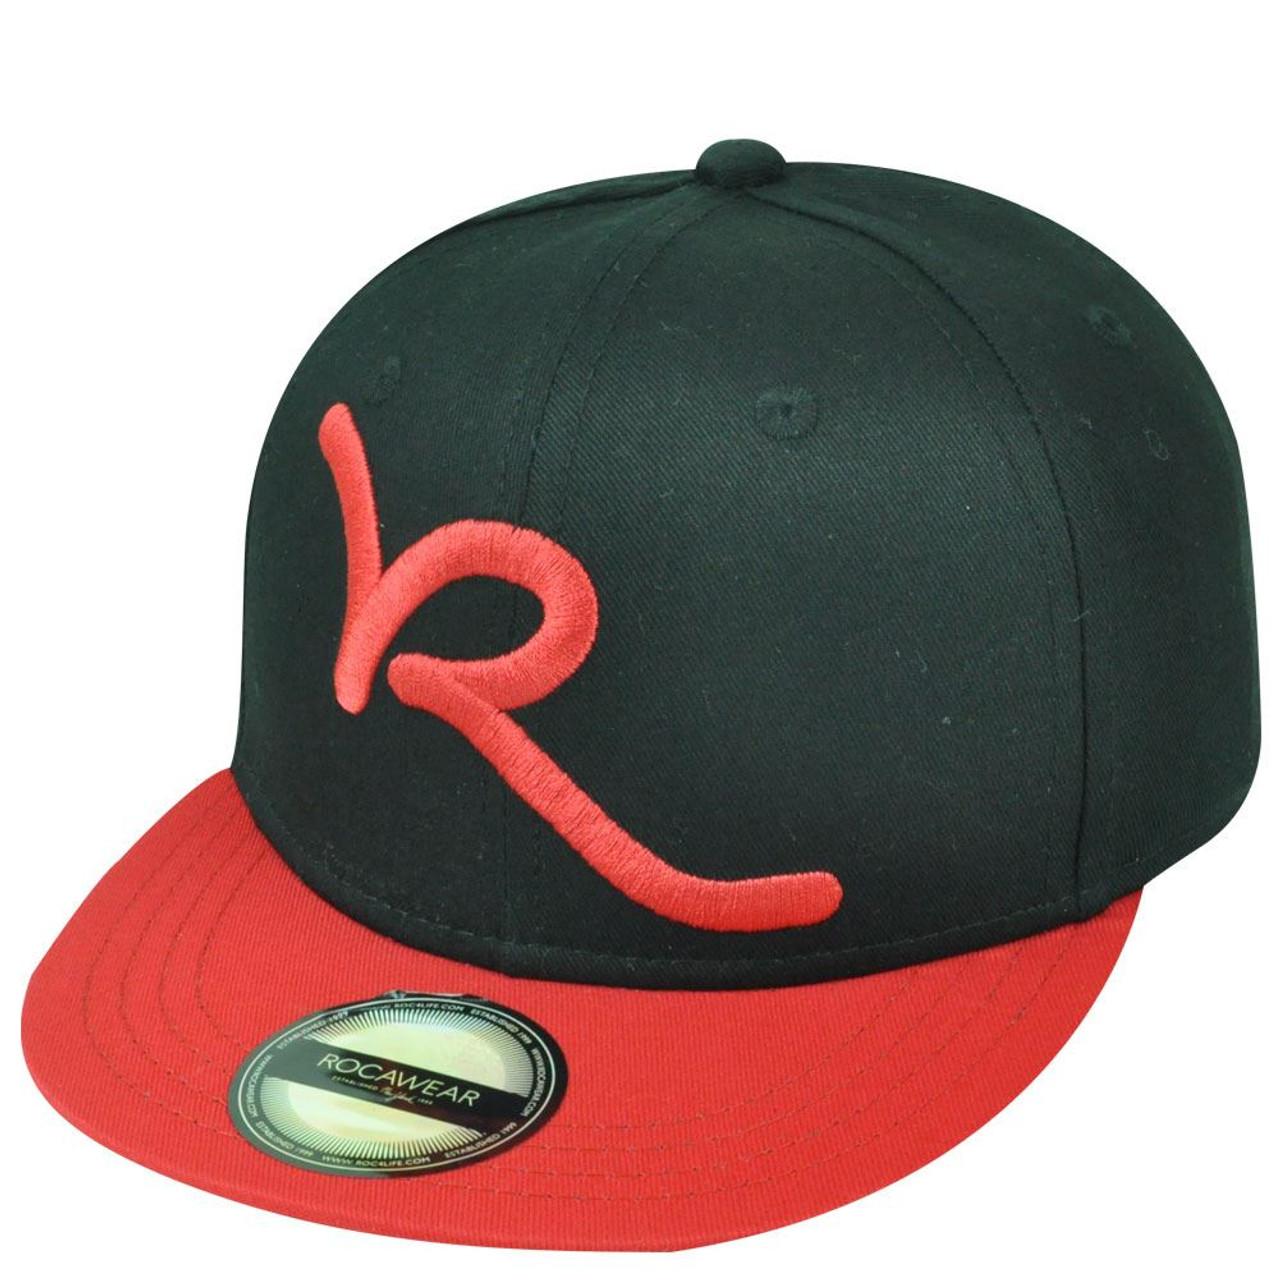 b3d2a50a Jay Z Rocawear R Script Core Brand Youth Flat Bill Snapback Hat Cap Black  Red - Cap Store Online.com